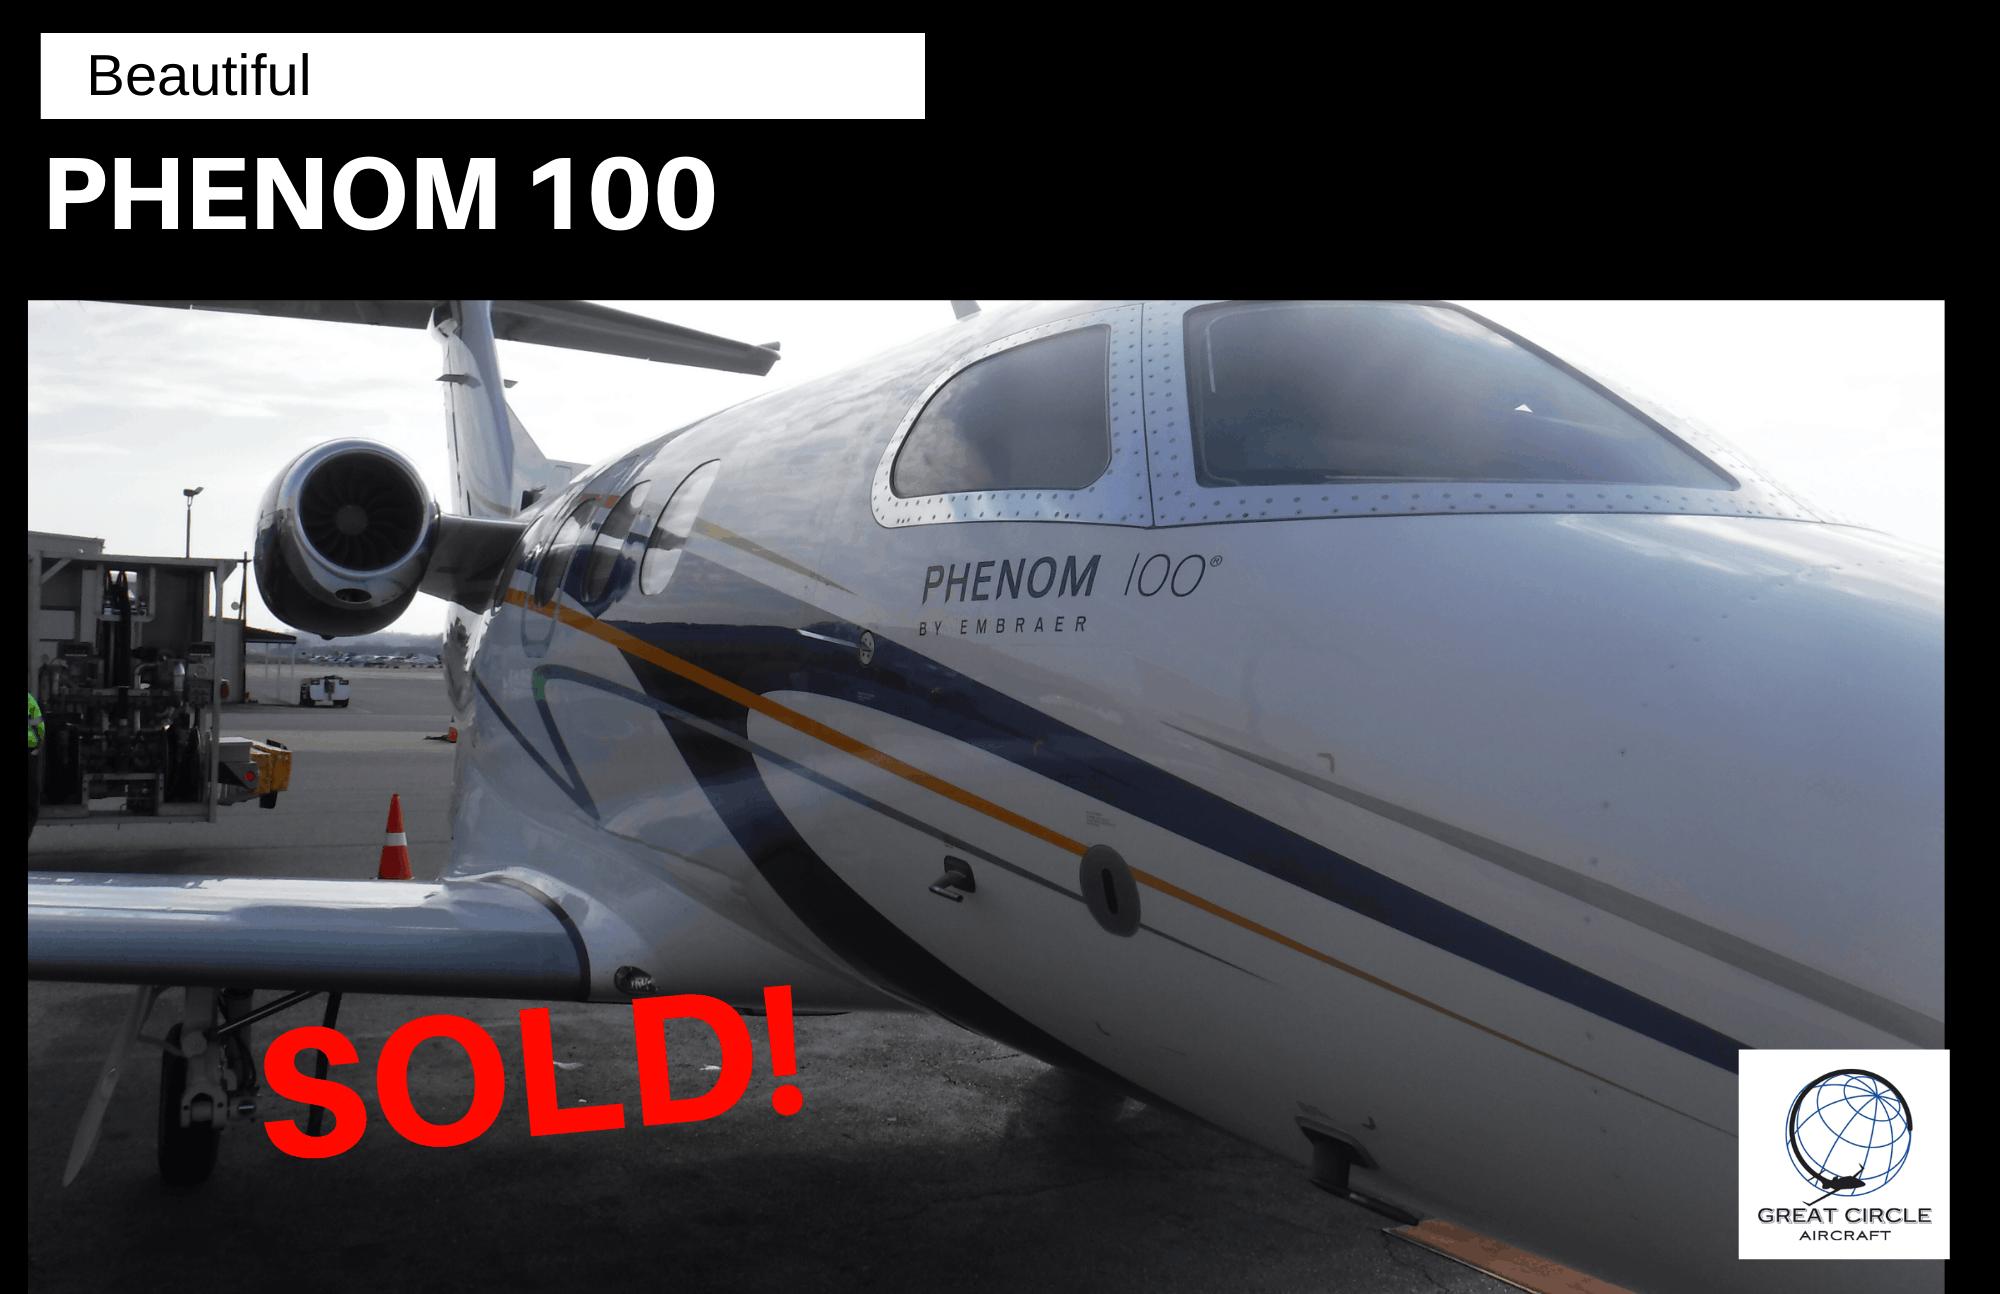 Phenom 100 - Sold